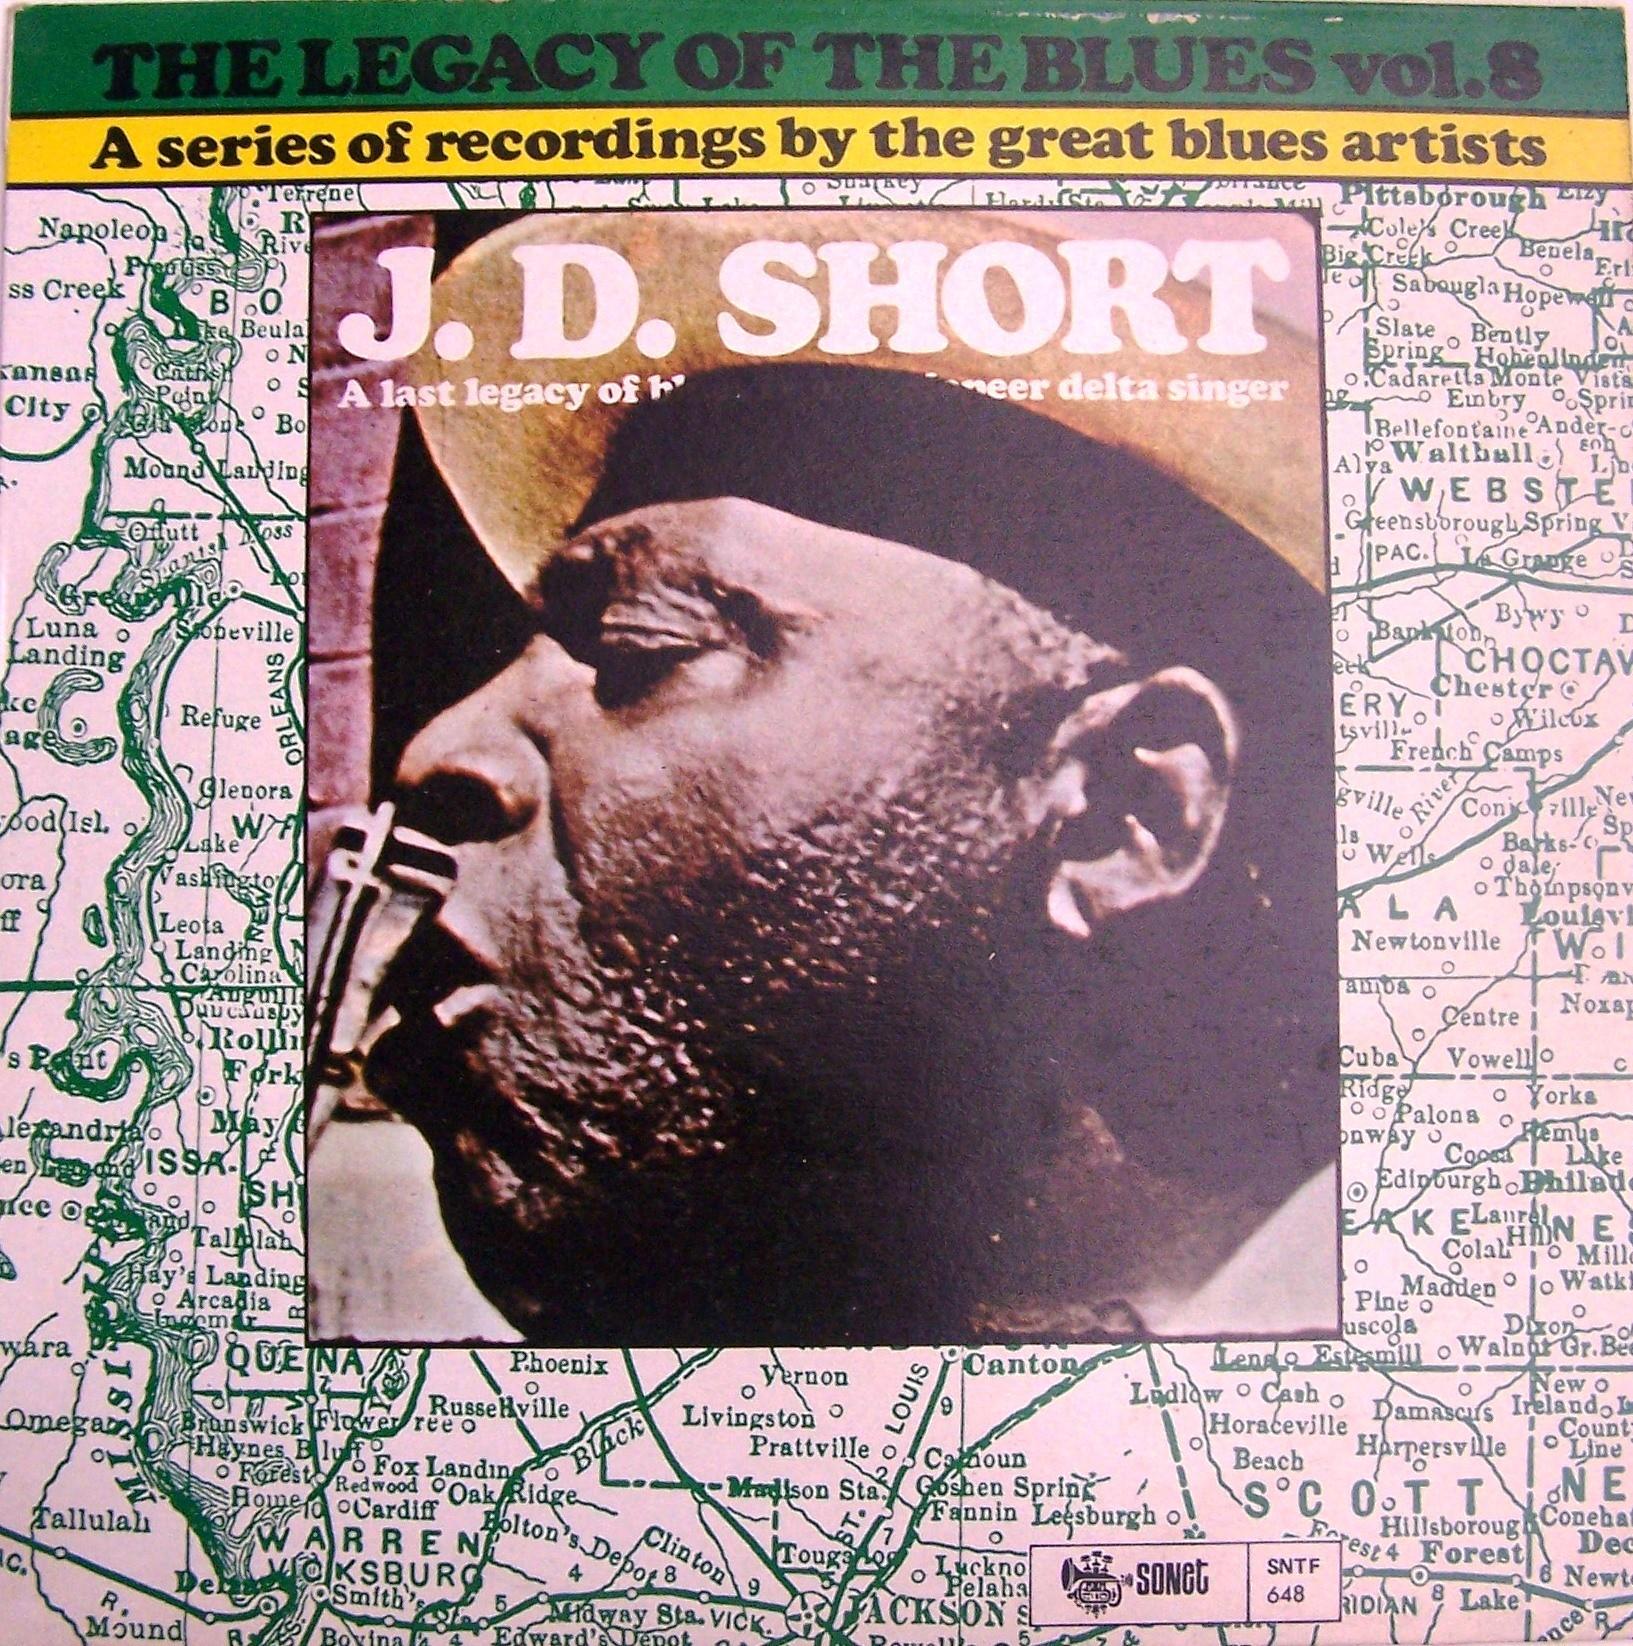 Short Jd - Legacy Of The Blues Vol 8